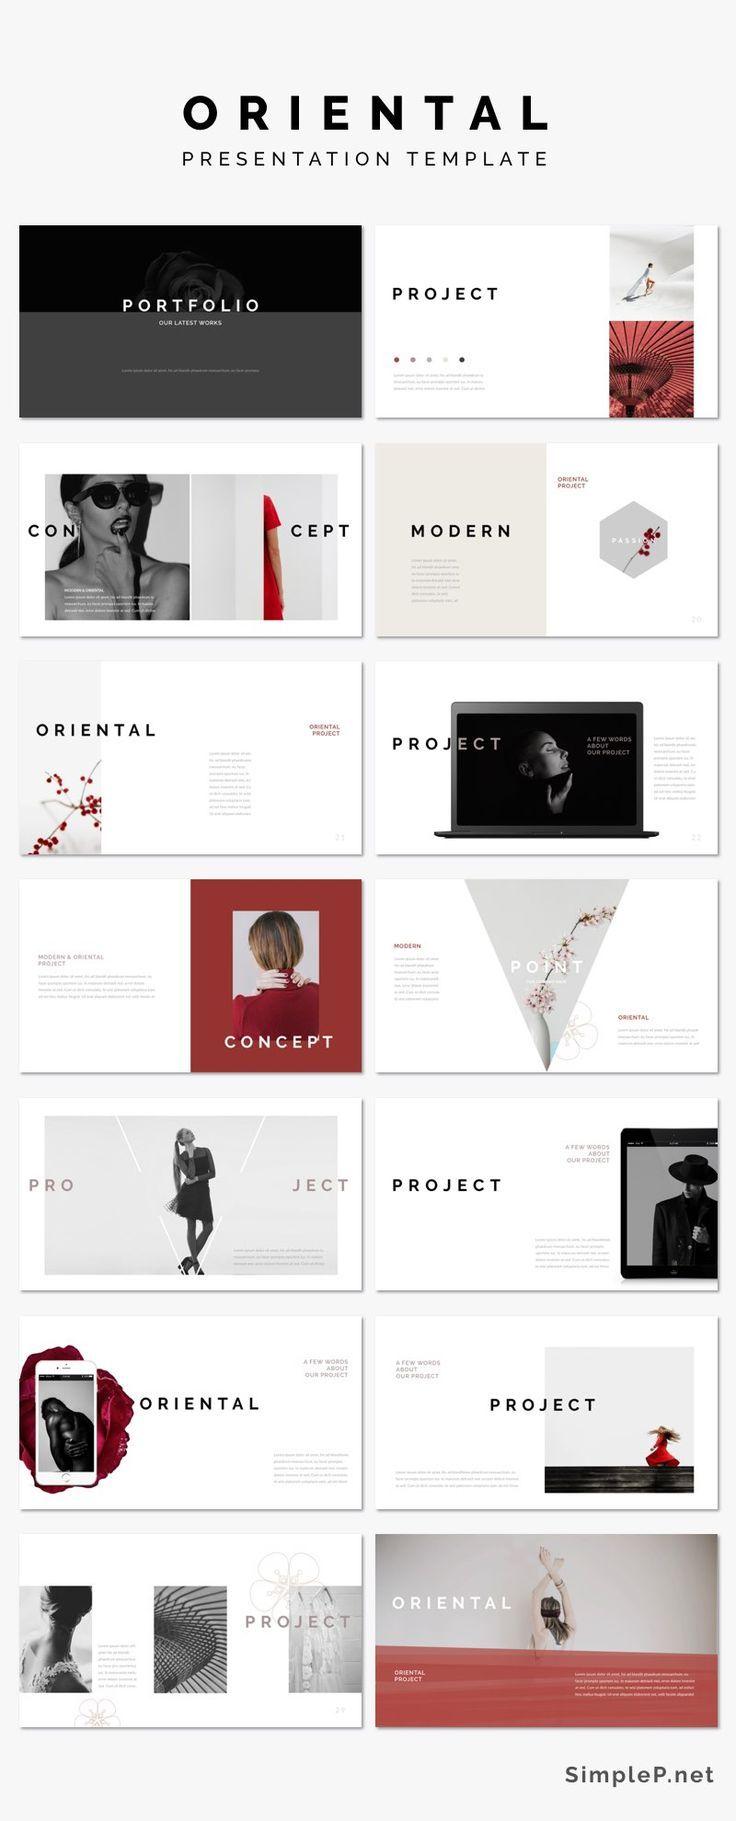 Oriental Powerpoint Template Presentation Layout Presentation Design Layout Design